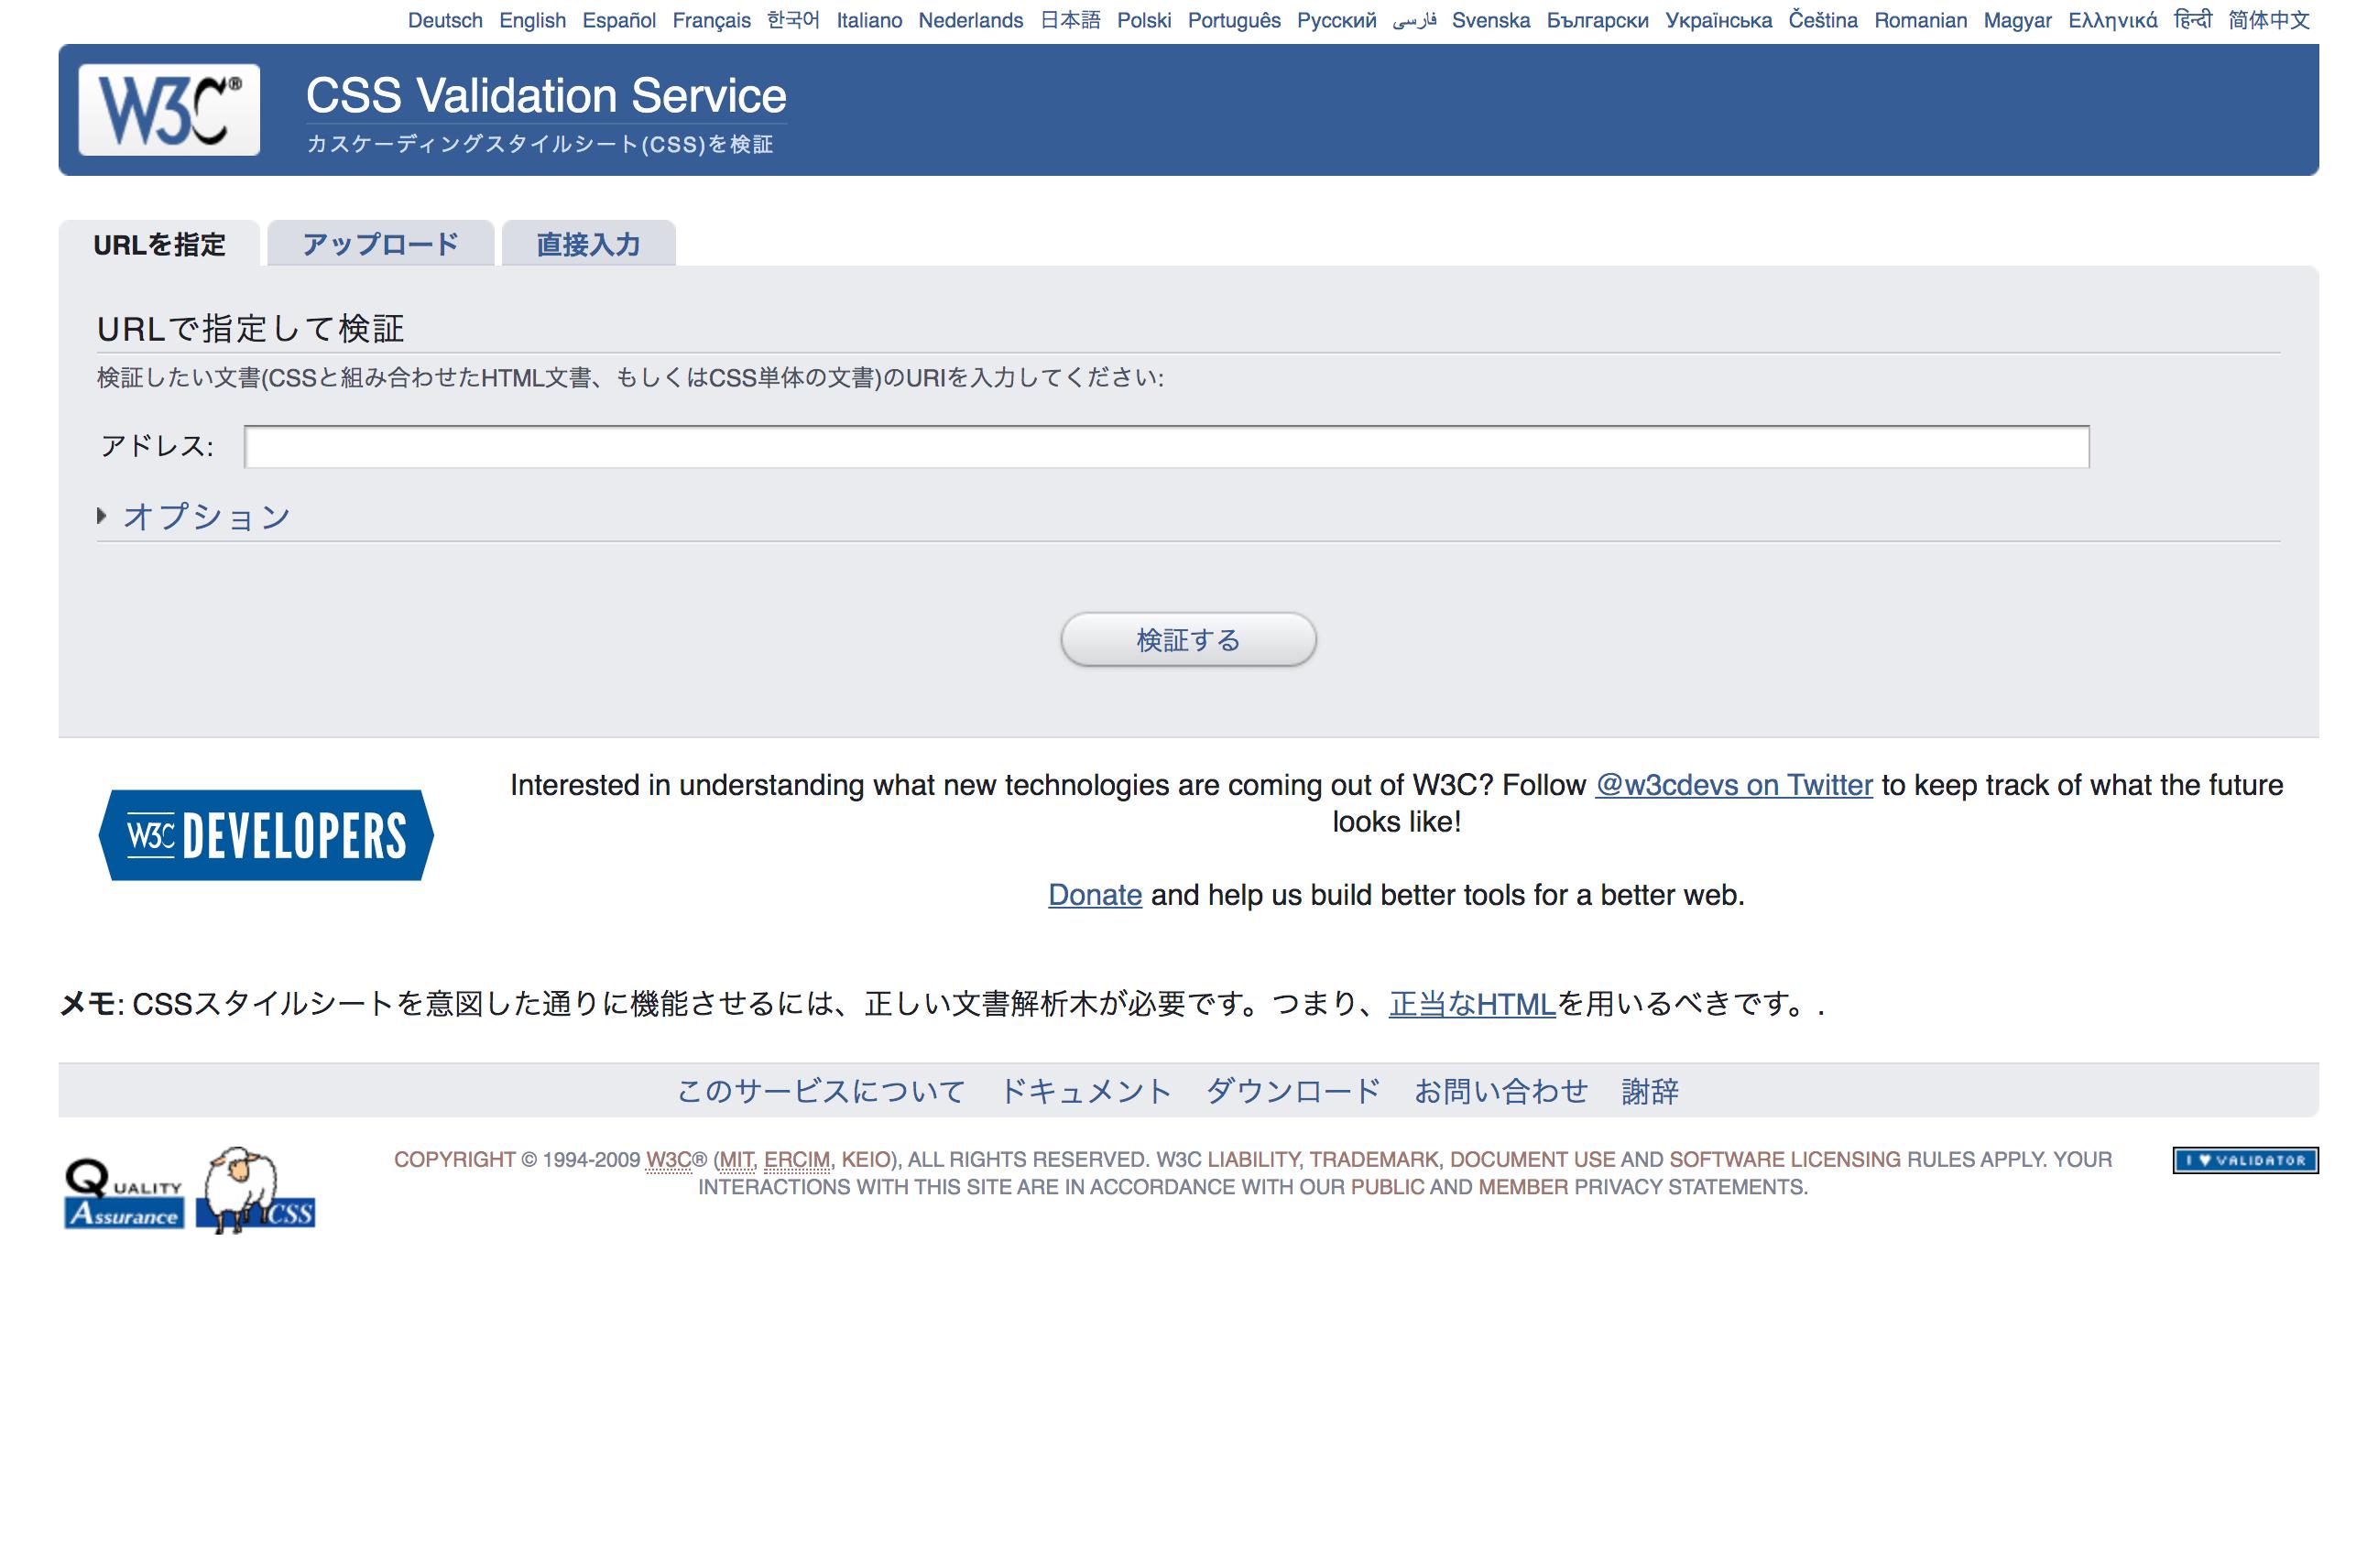 W3C CSS Validator